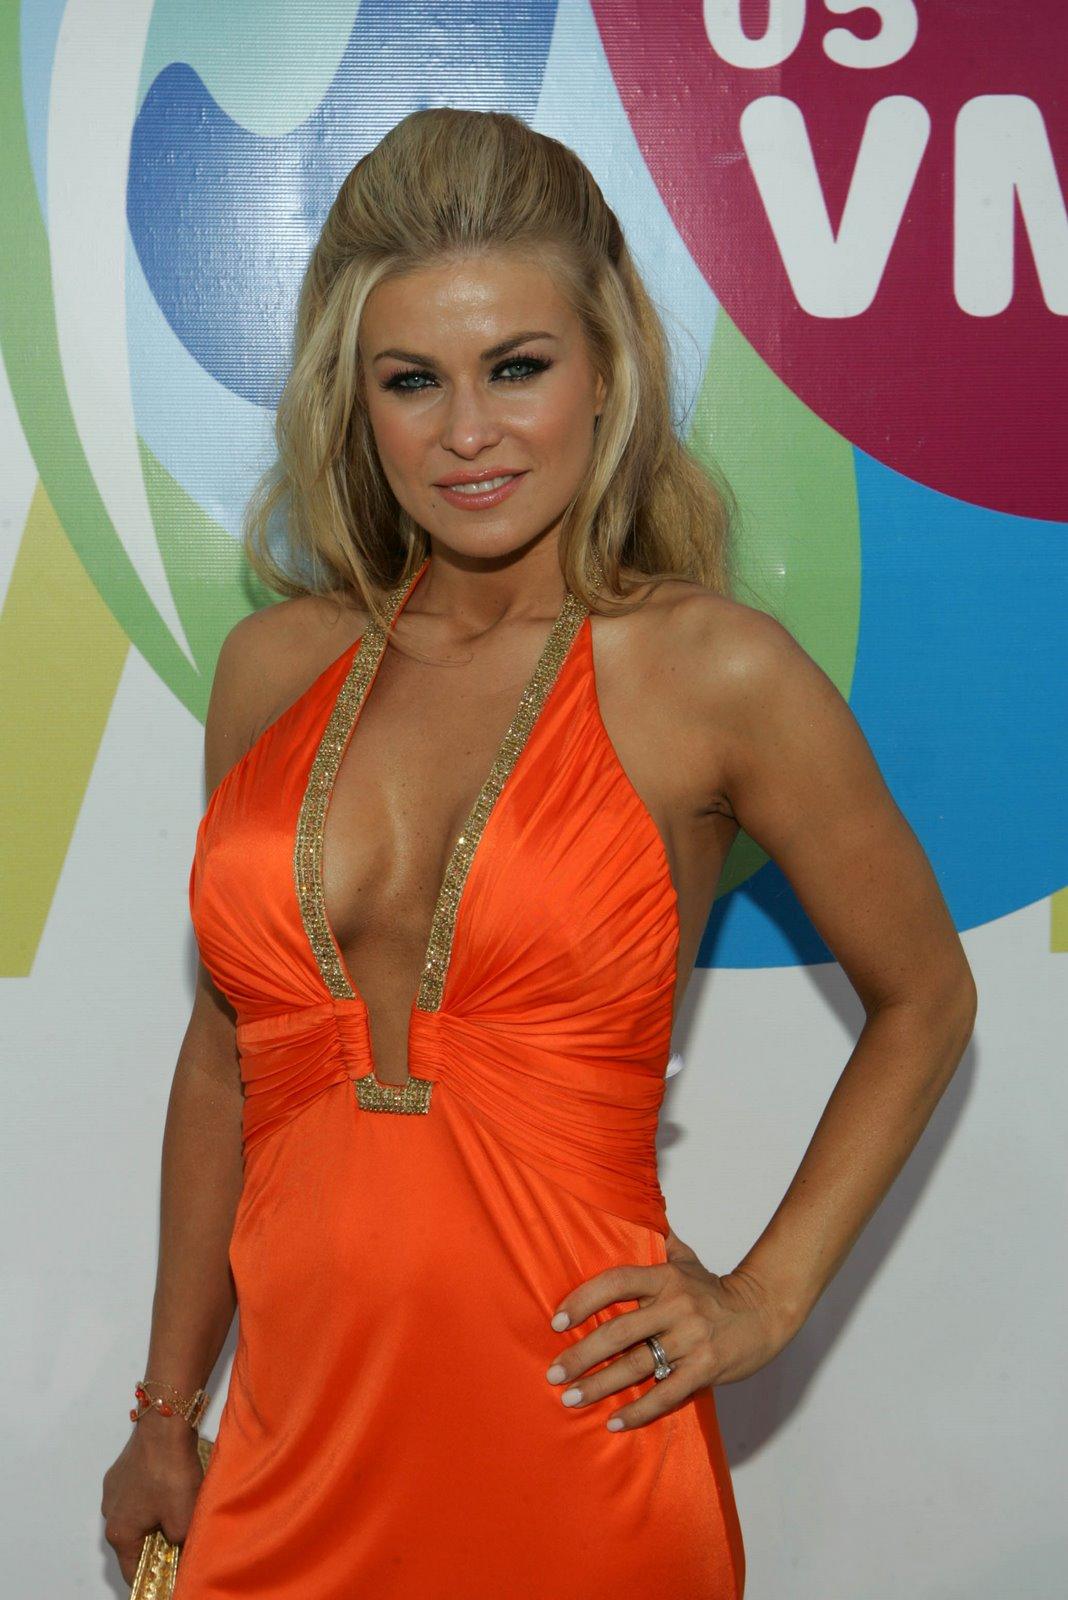 http://4.bp.blogspot.com/_D7HeuMReRVk/R1IRKt4dn7I/AAAAAAAAAfs/mbwyyLupzyM/s1600-R/Carmen_Electra___2005_MTV_Video_Music_Awards___carmenelectraarrivesto2005mtvv2.jpg